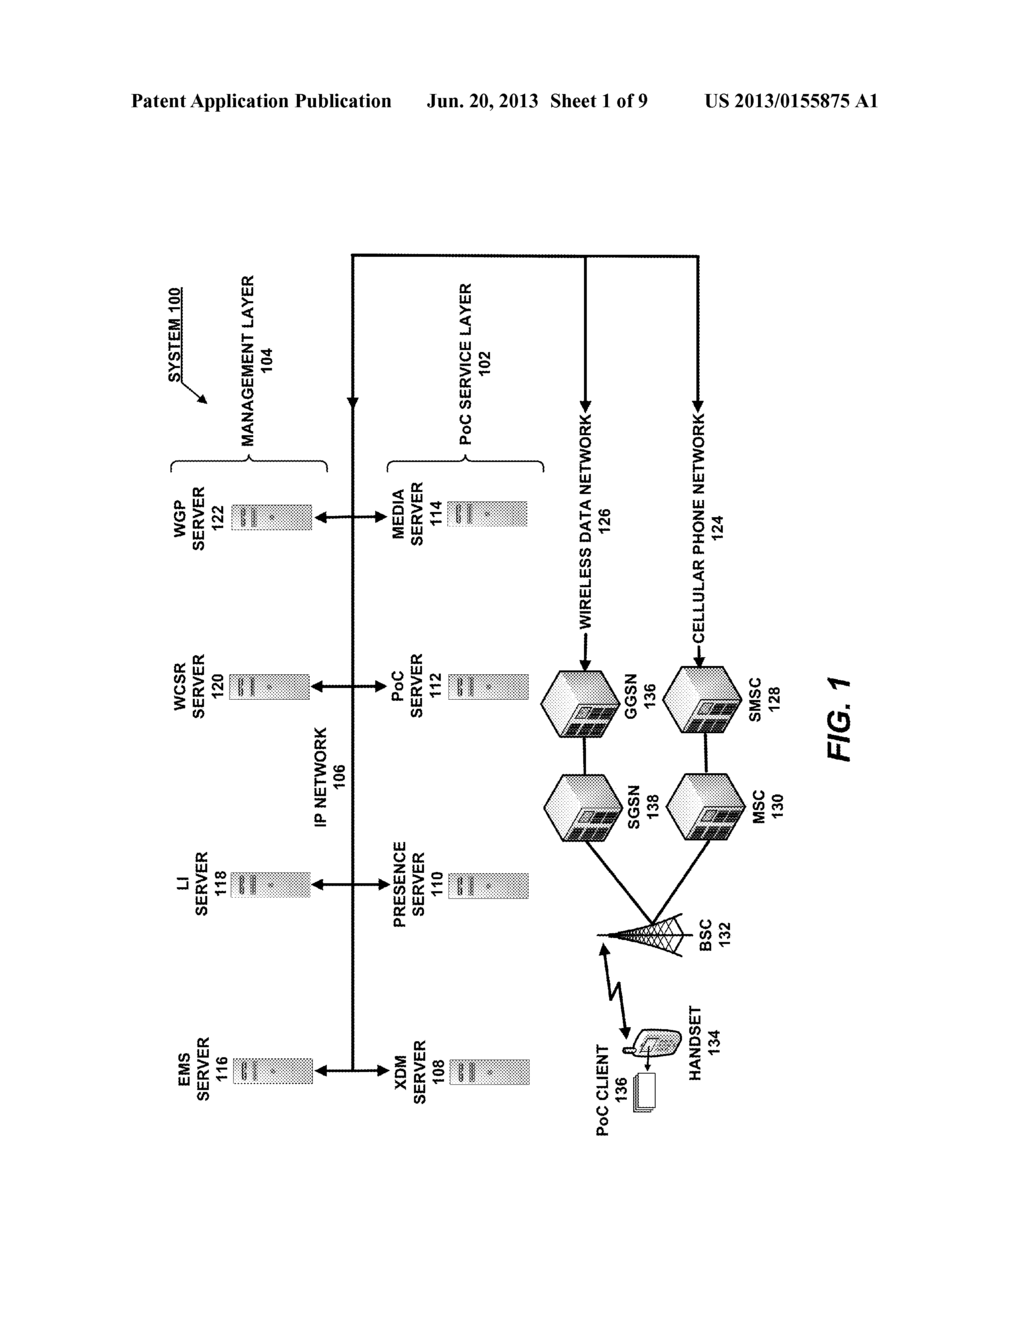 push to talk over cellular poc diagram schematic and image 02 rh patentsencyclopedia com Series Circuit Diagram Circuit Symbols